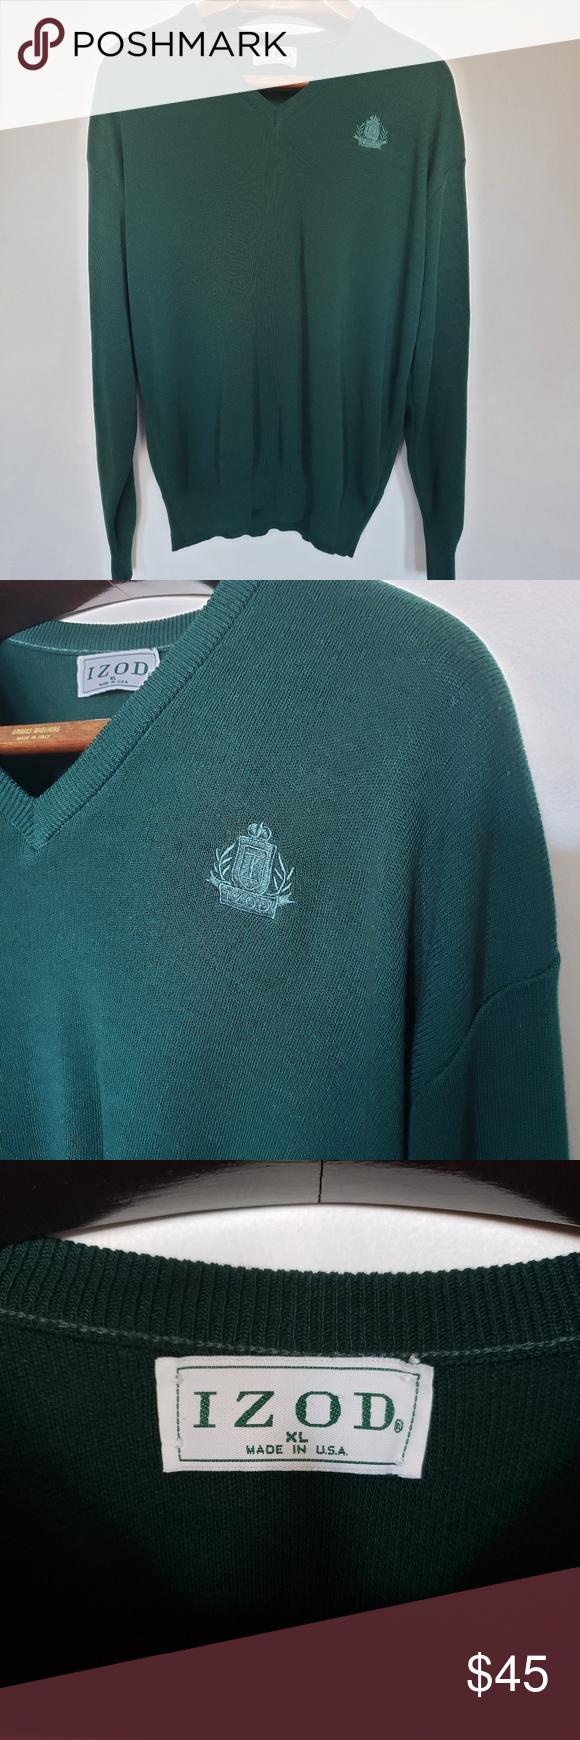 "Vintage // IZOD sweatshirt • S i z e R e f e r e n c e • -Model: 5""2 • D e t a i l s •  -Condition: Great!  ⚜ Vtg is pre-loved. Normal..."